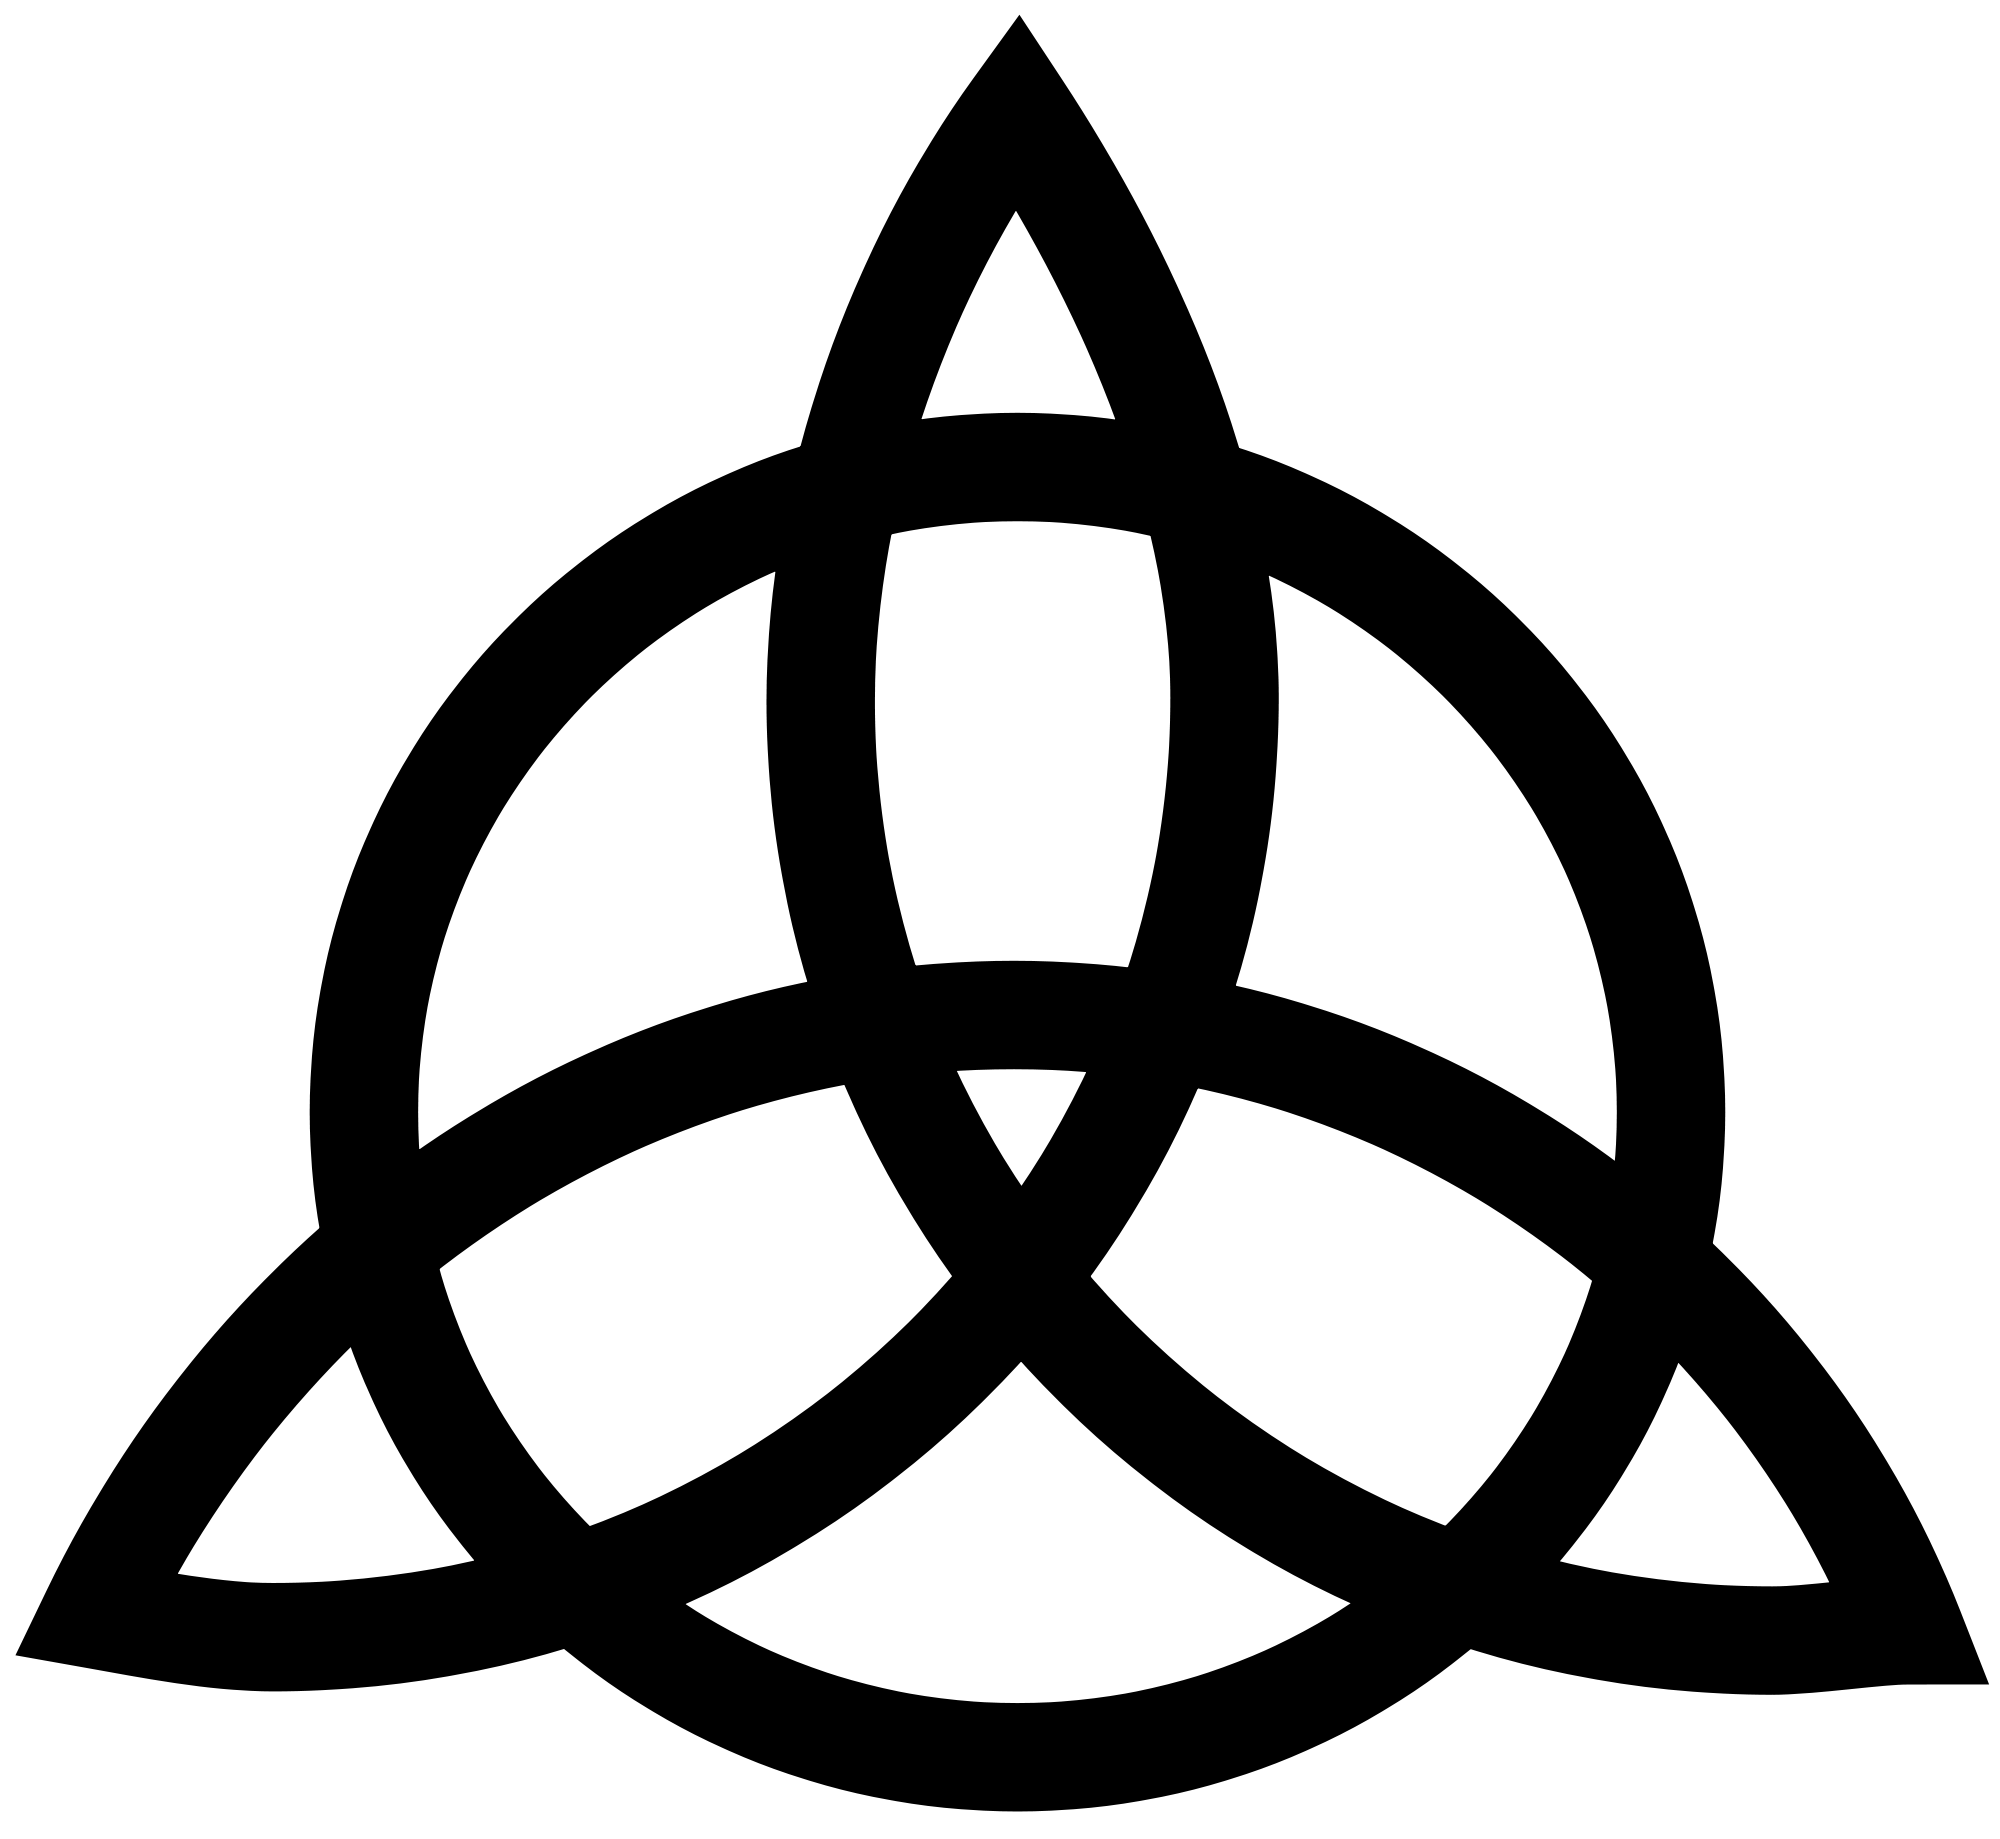 John Paul Jones Sigil Interlaced Triquetra Overlaying Circle Used Oon The Led Zeppelin Iv Album Cover Simbolos Tatuajes Celtas Simbolos Celtas